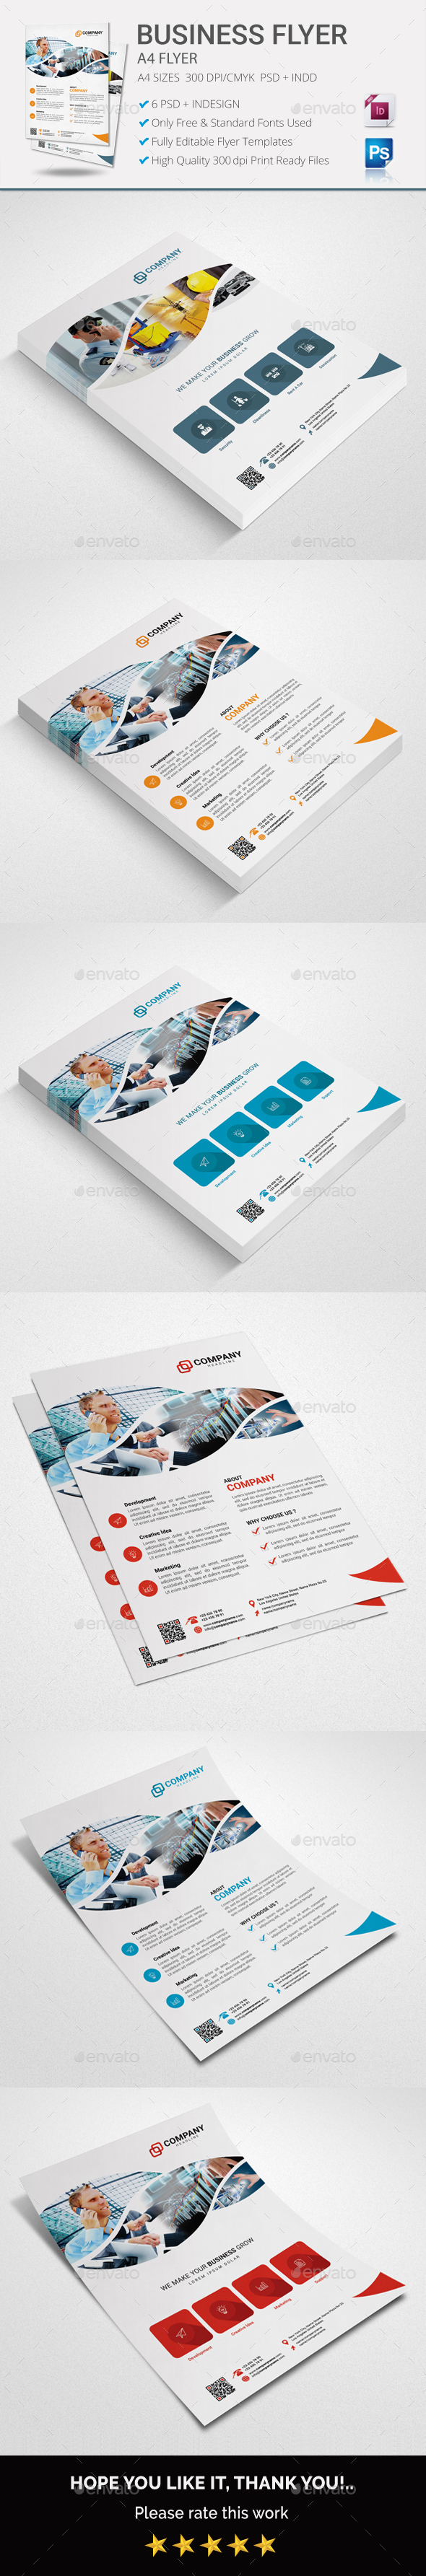 Business Flyer Vol 01 - Flyers Print Templates